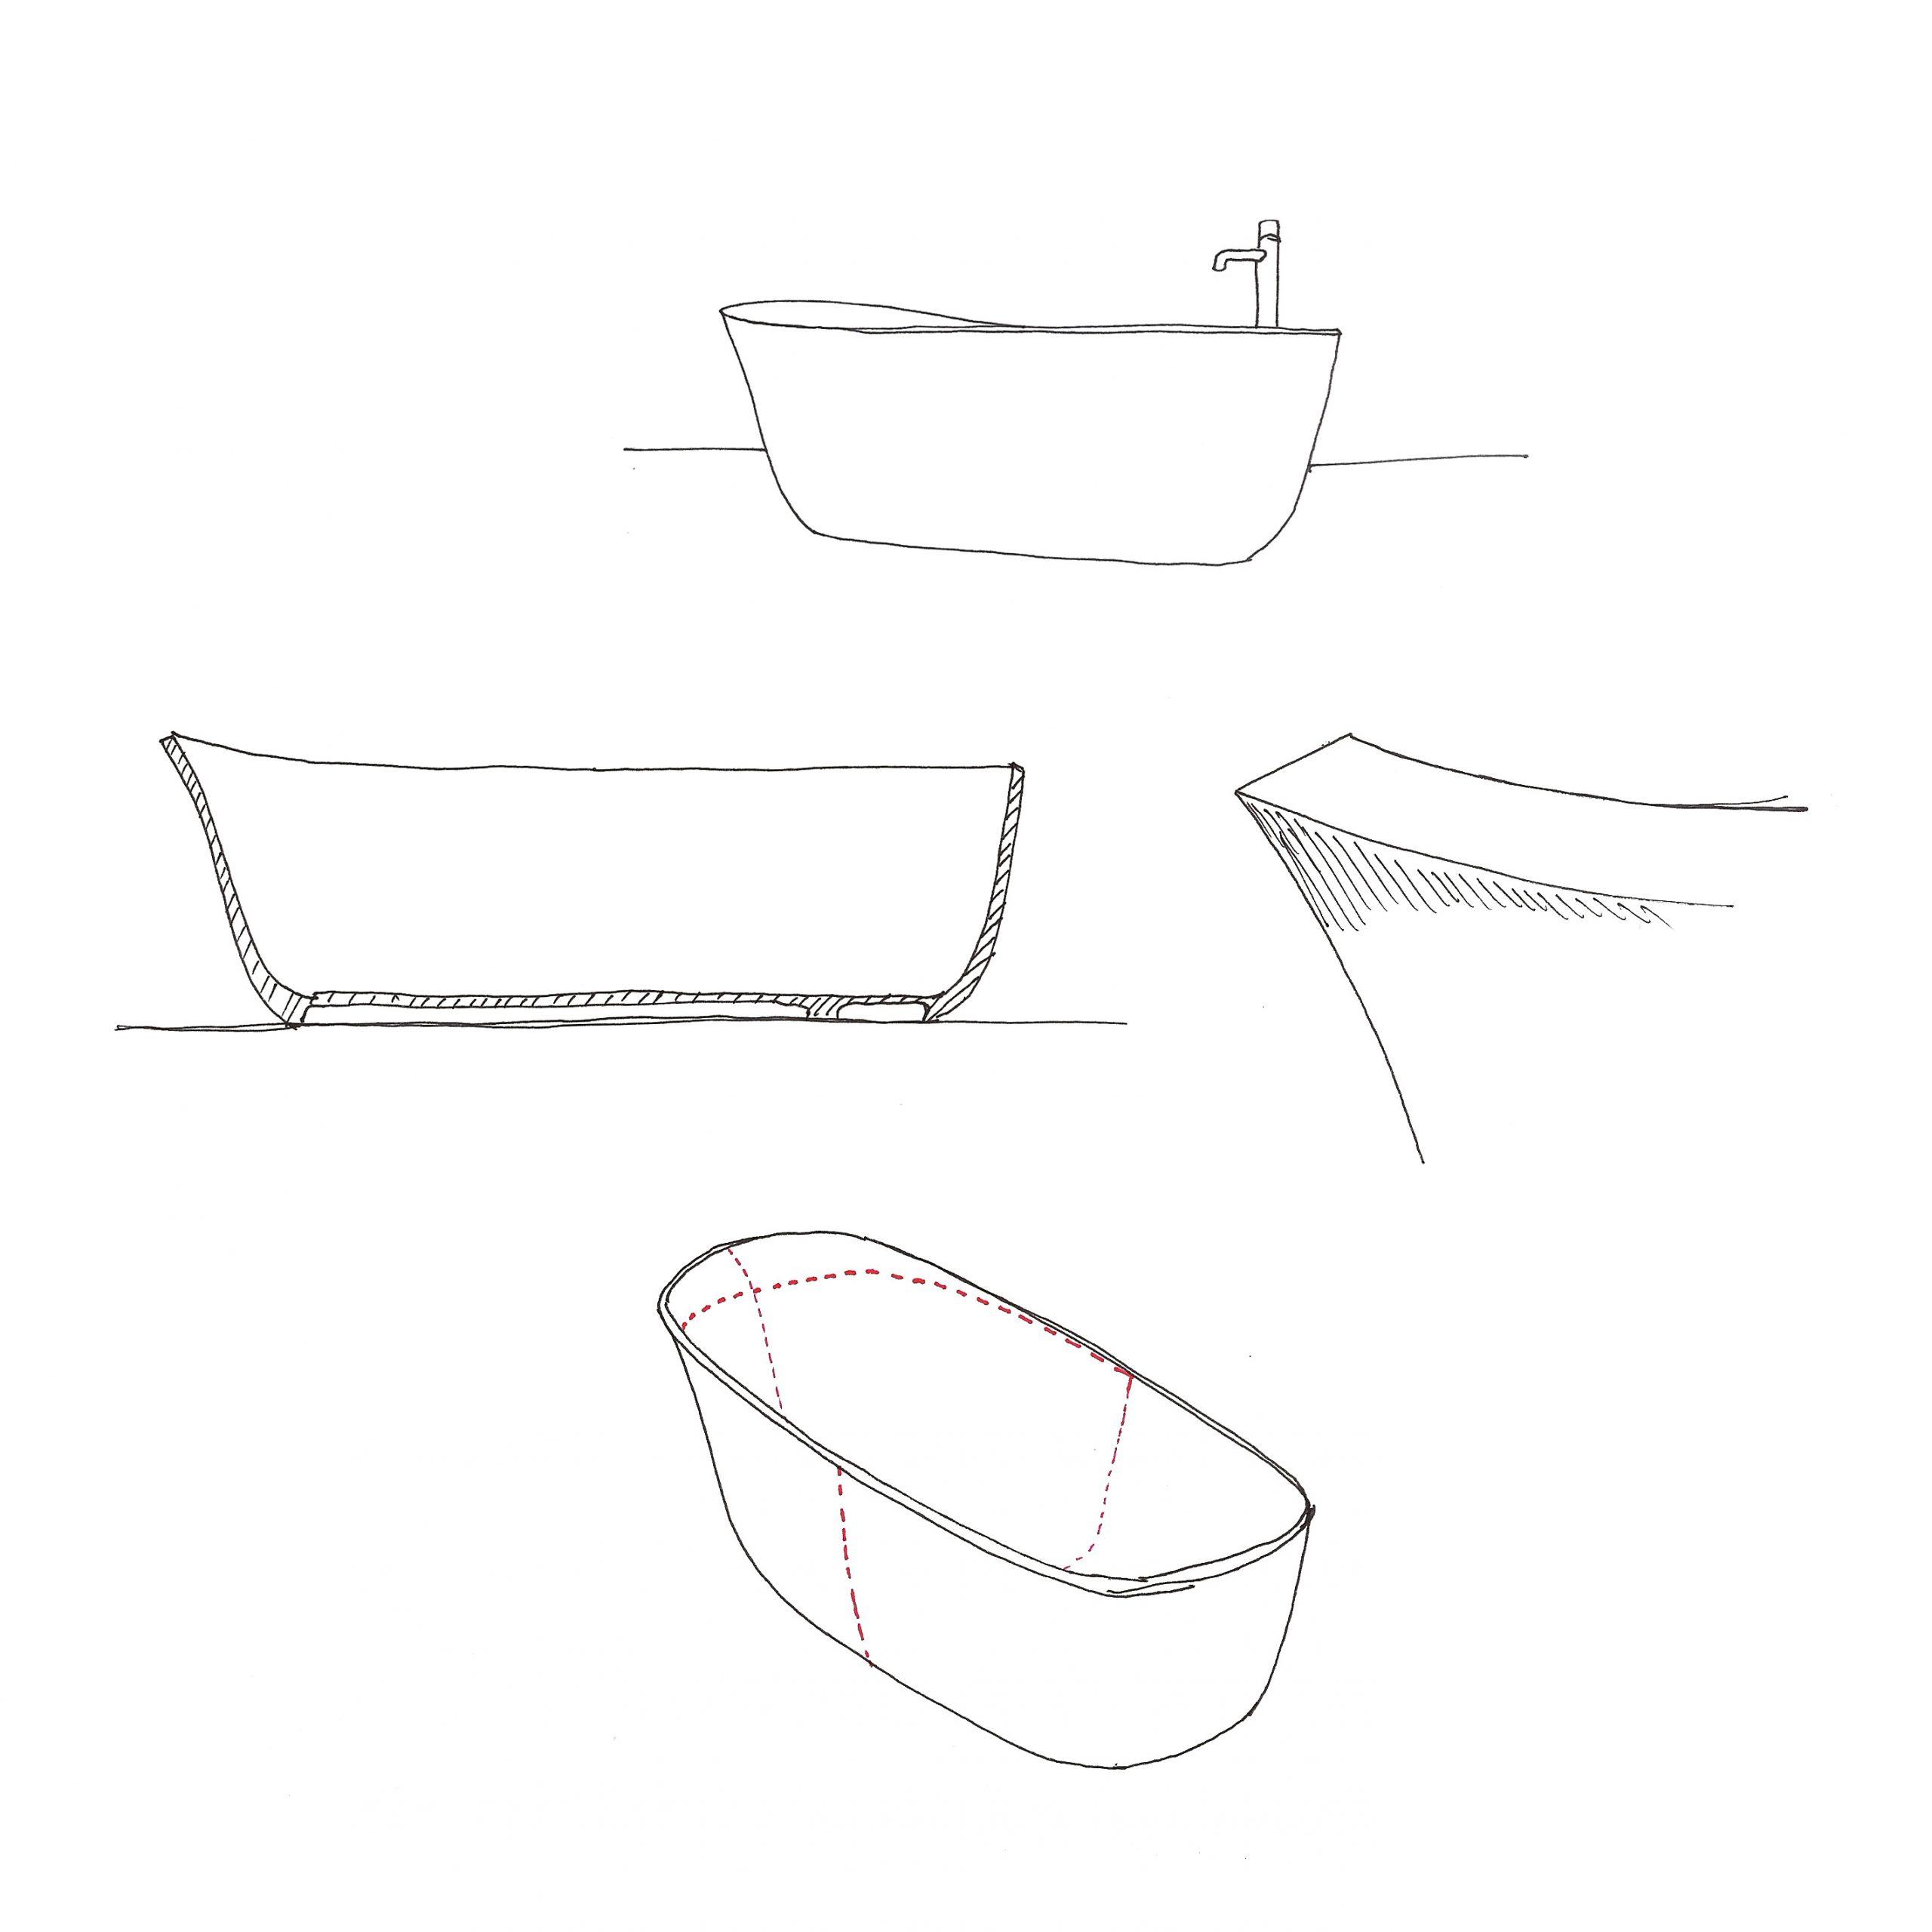 Dafne bathtub sketch by Debiasi Sandri for Antoniolupi